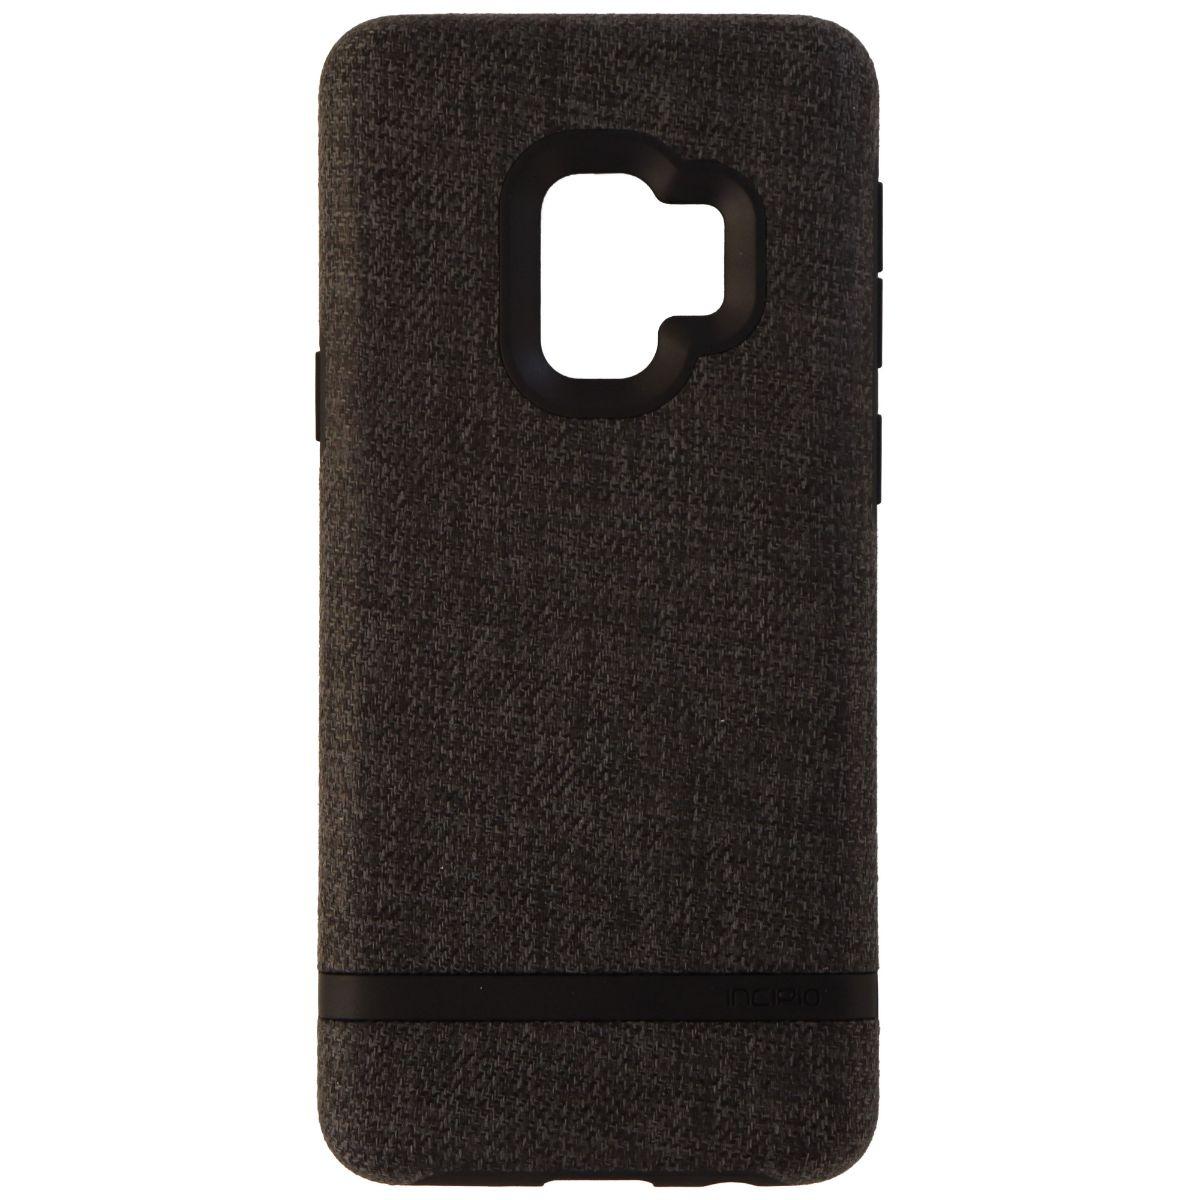 Incipio Esquire Series Fabric Case for Samsung Galaxy S9 - Dark Gray/Black